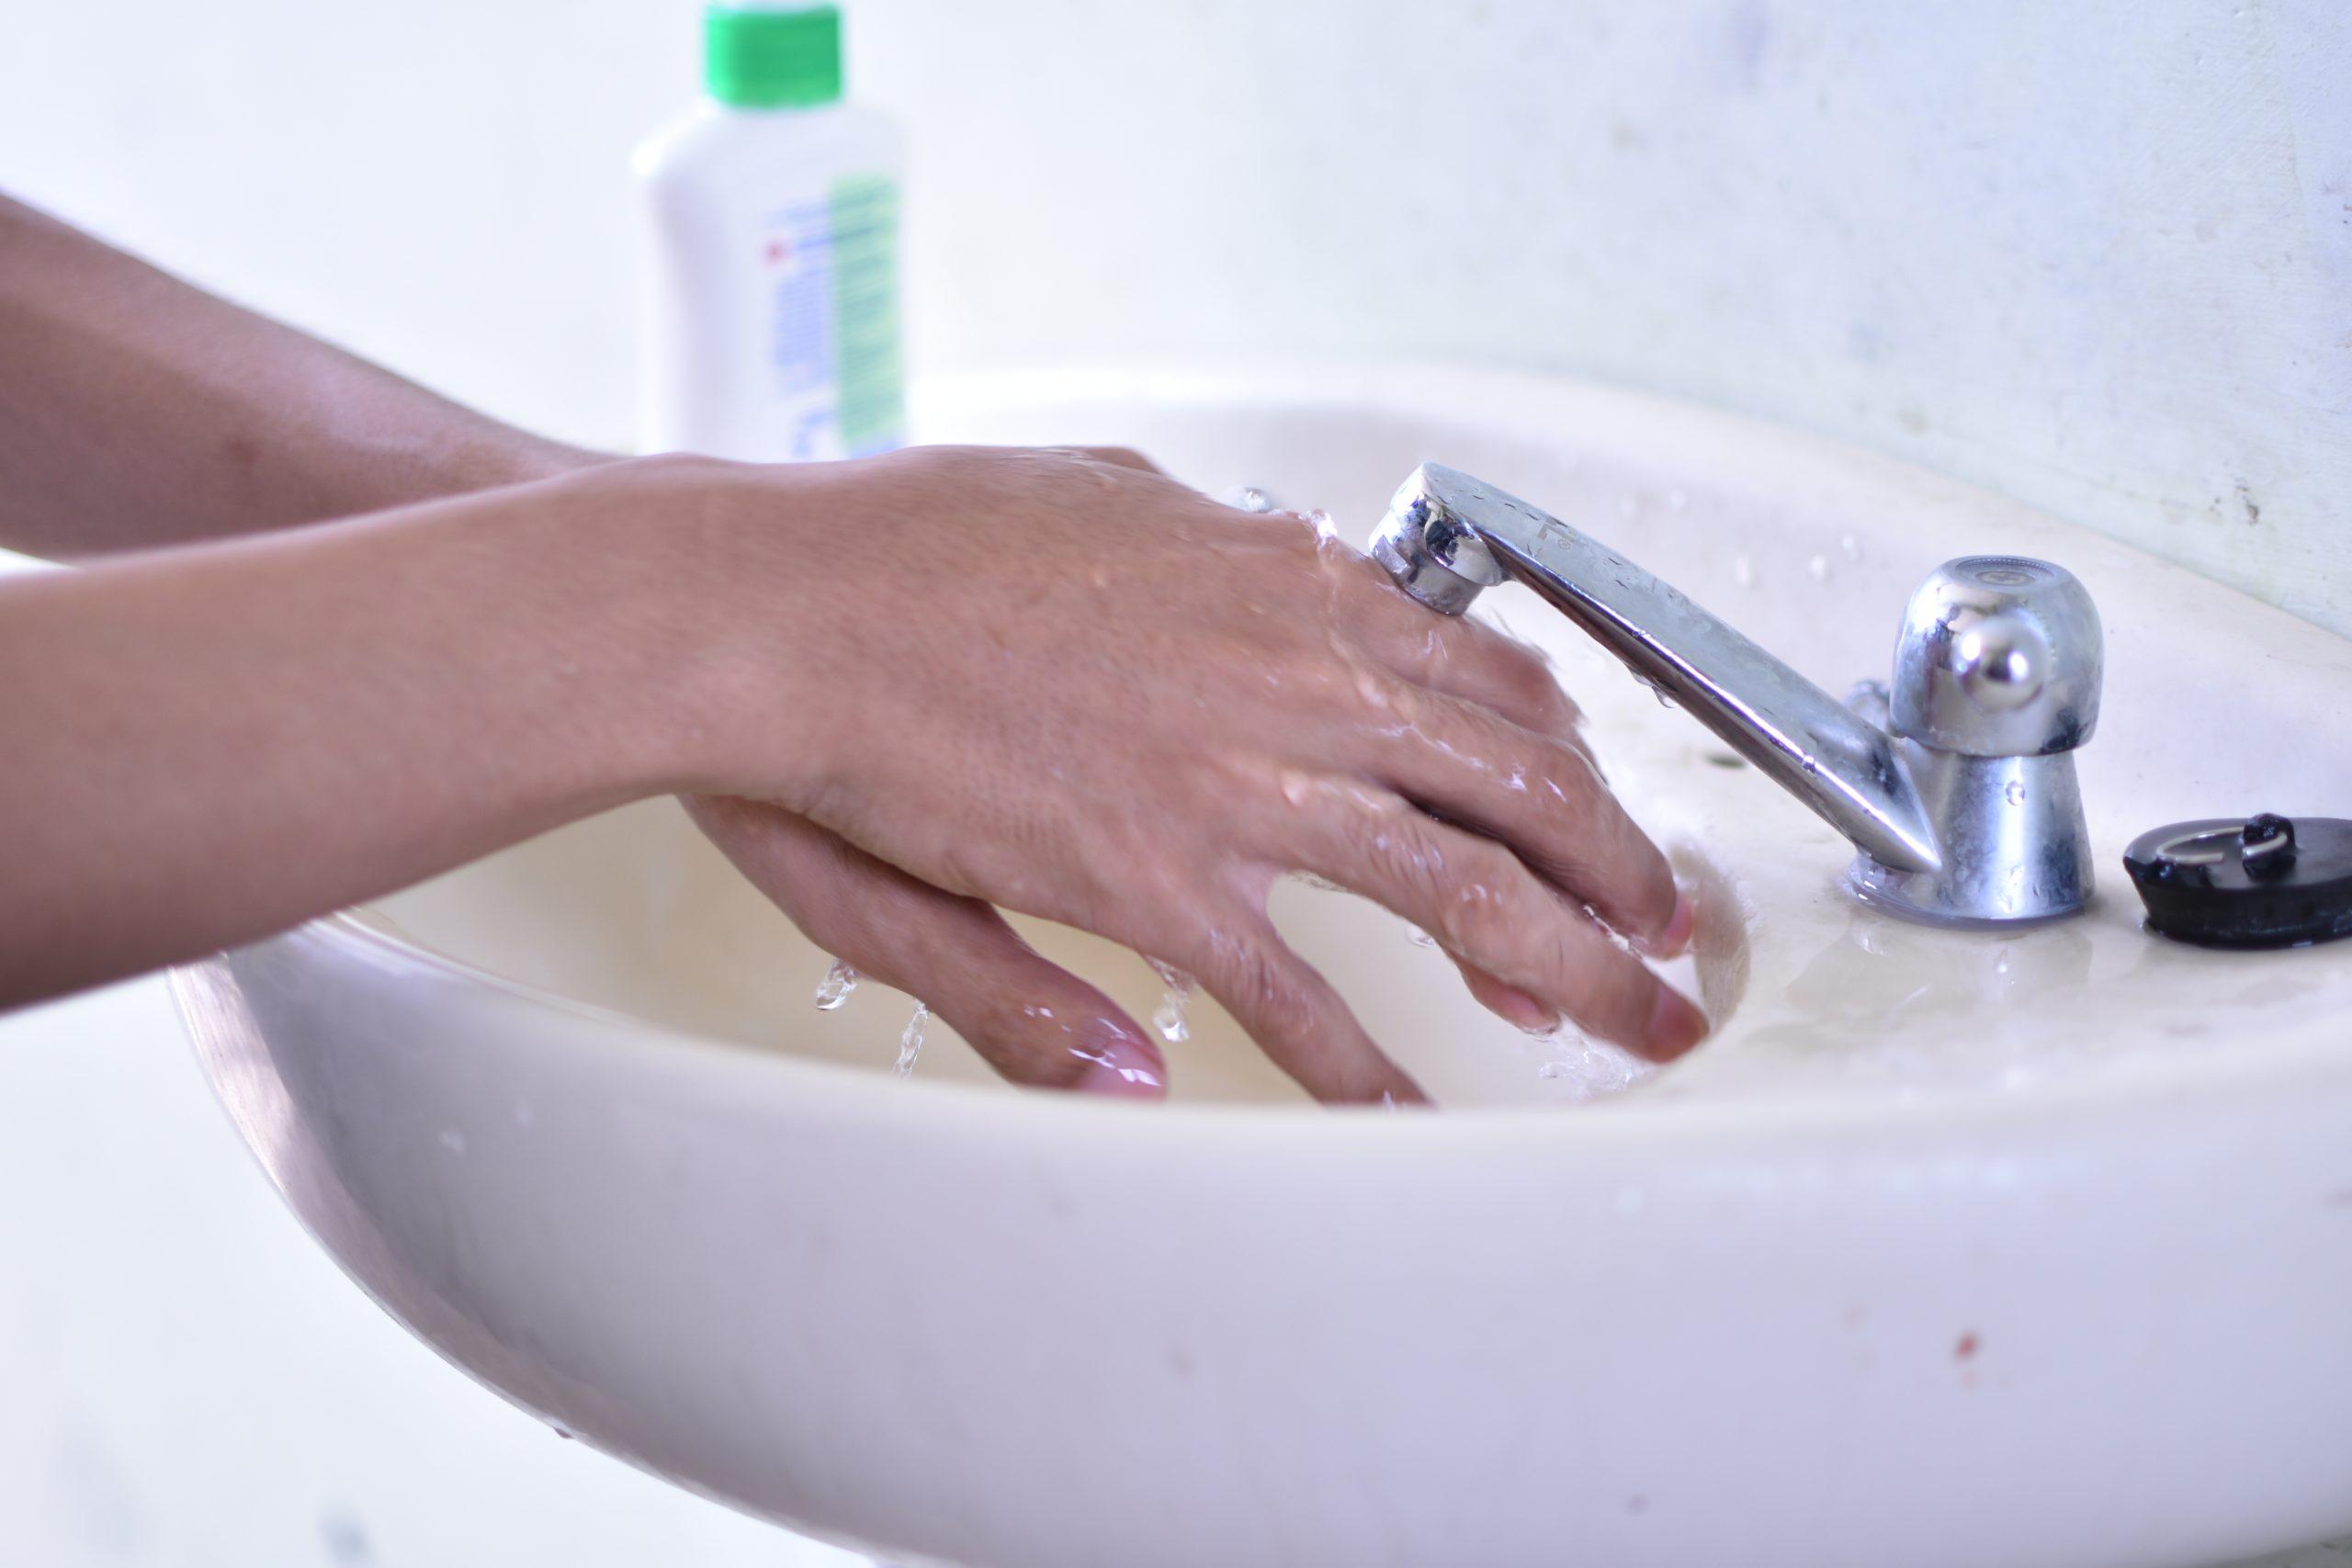 cuci tangan santri sarang